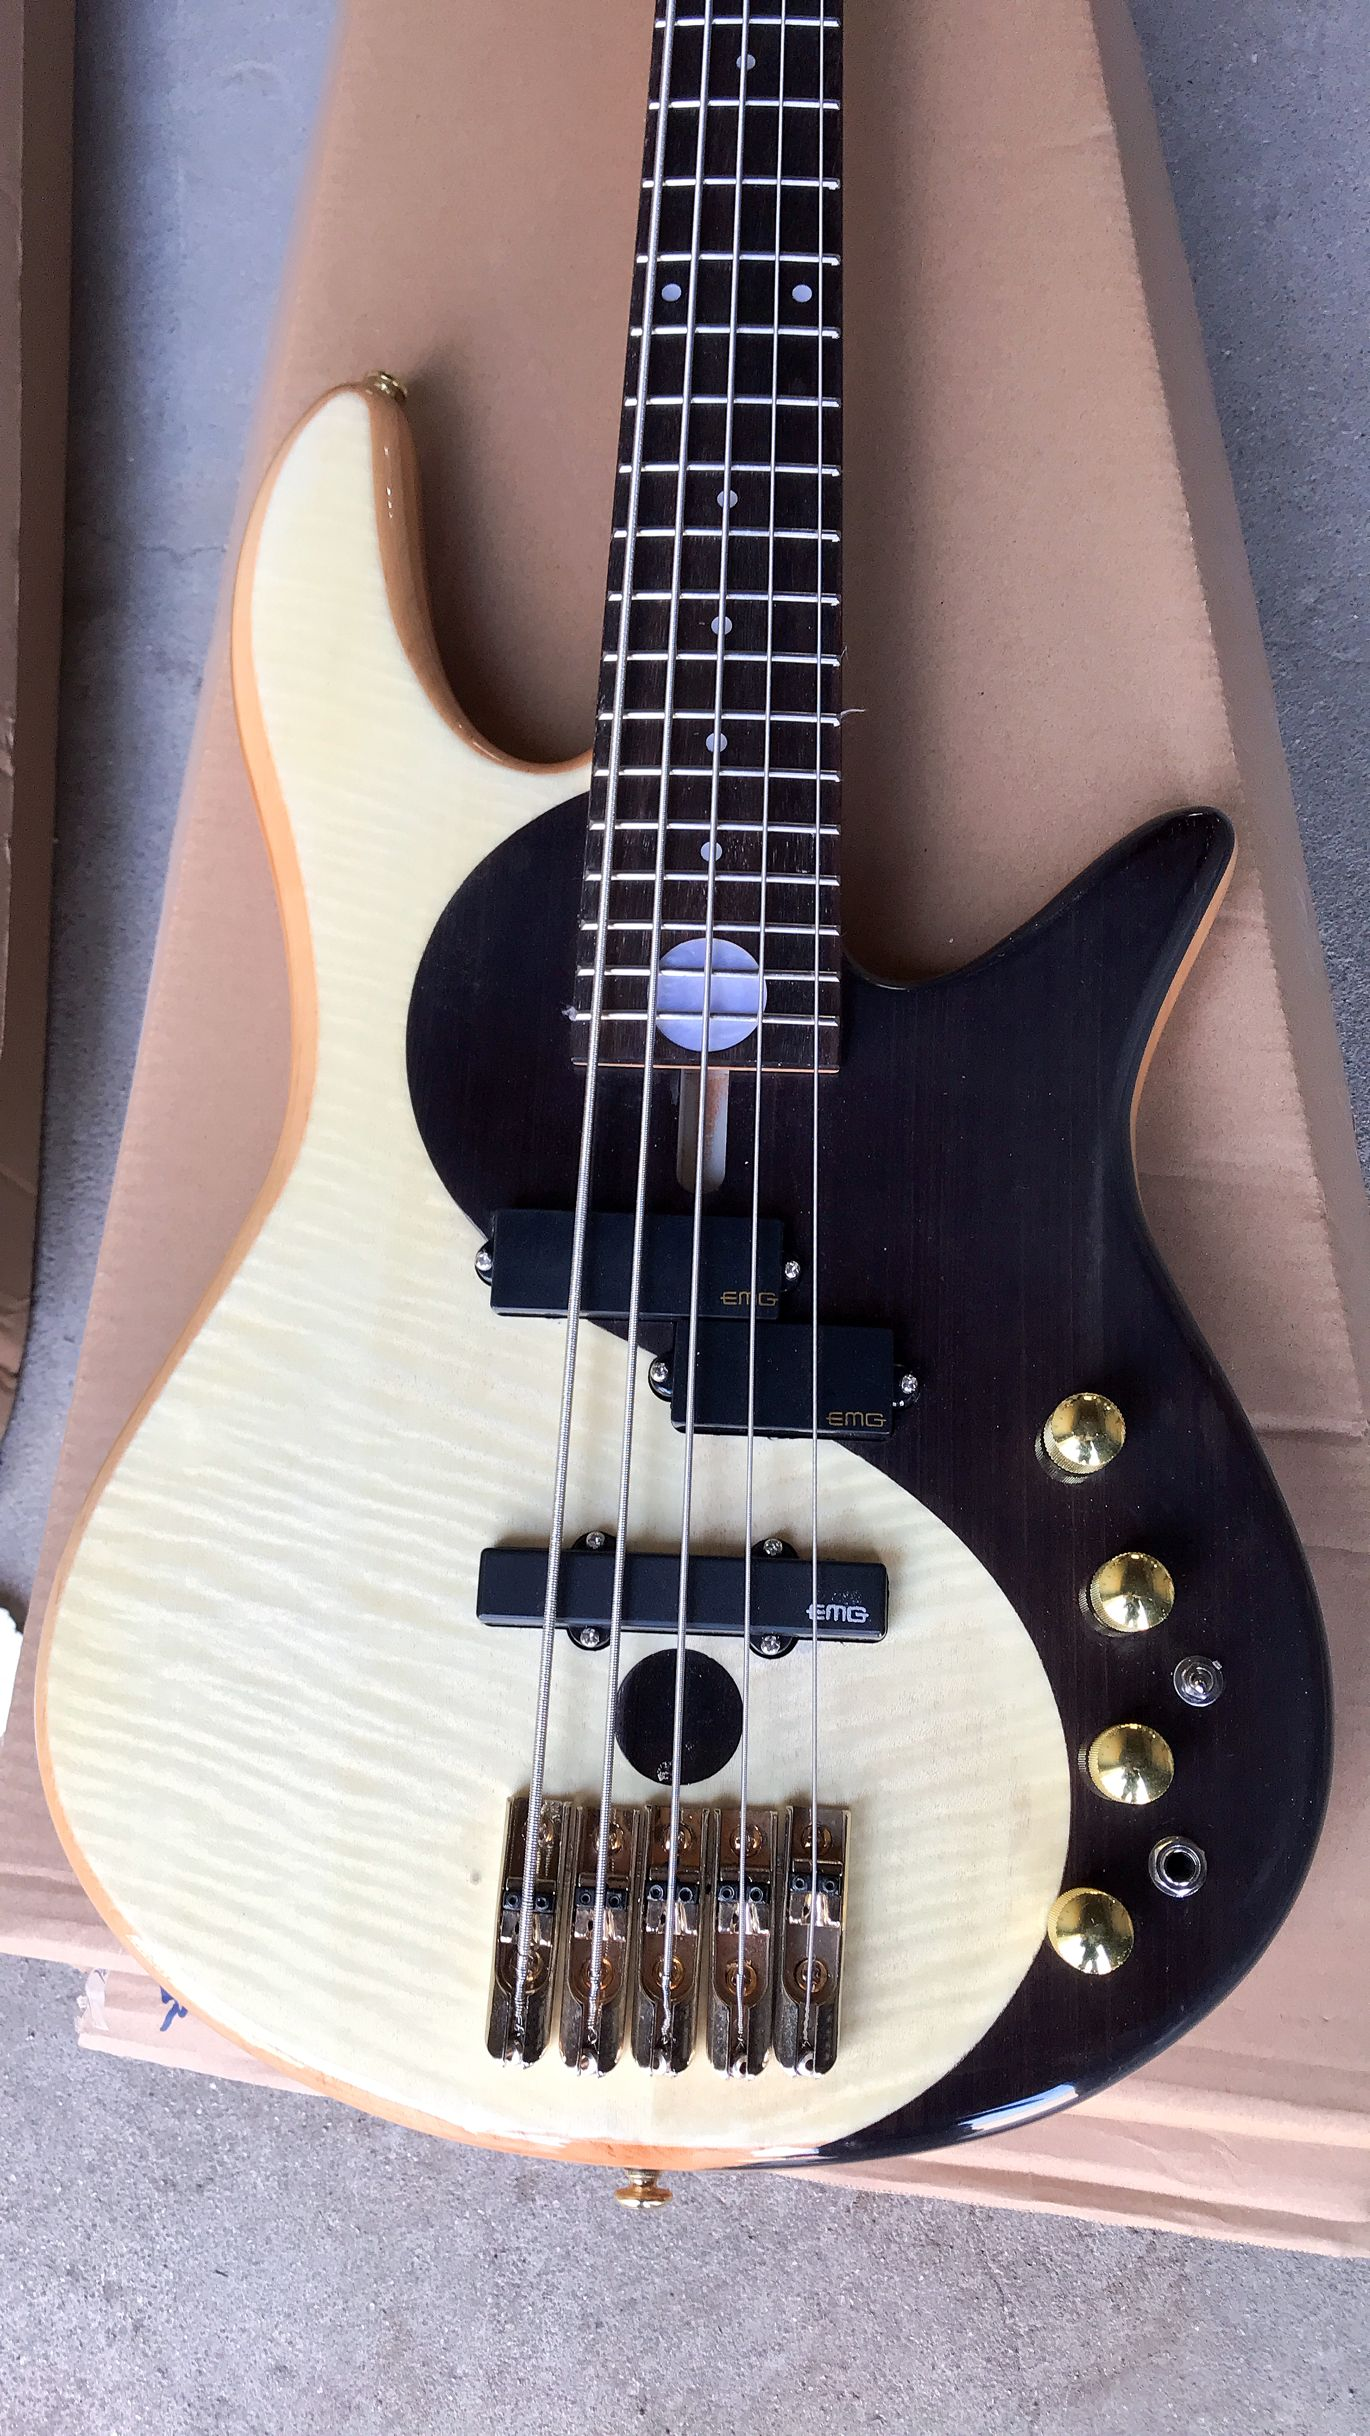 free shipping New arrival Yin an Yang 5 strings Bass guitar gold hardware electric guitar bass